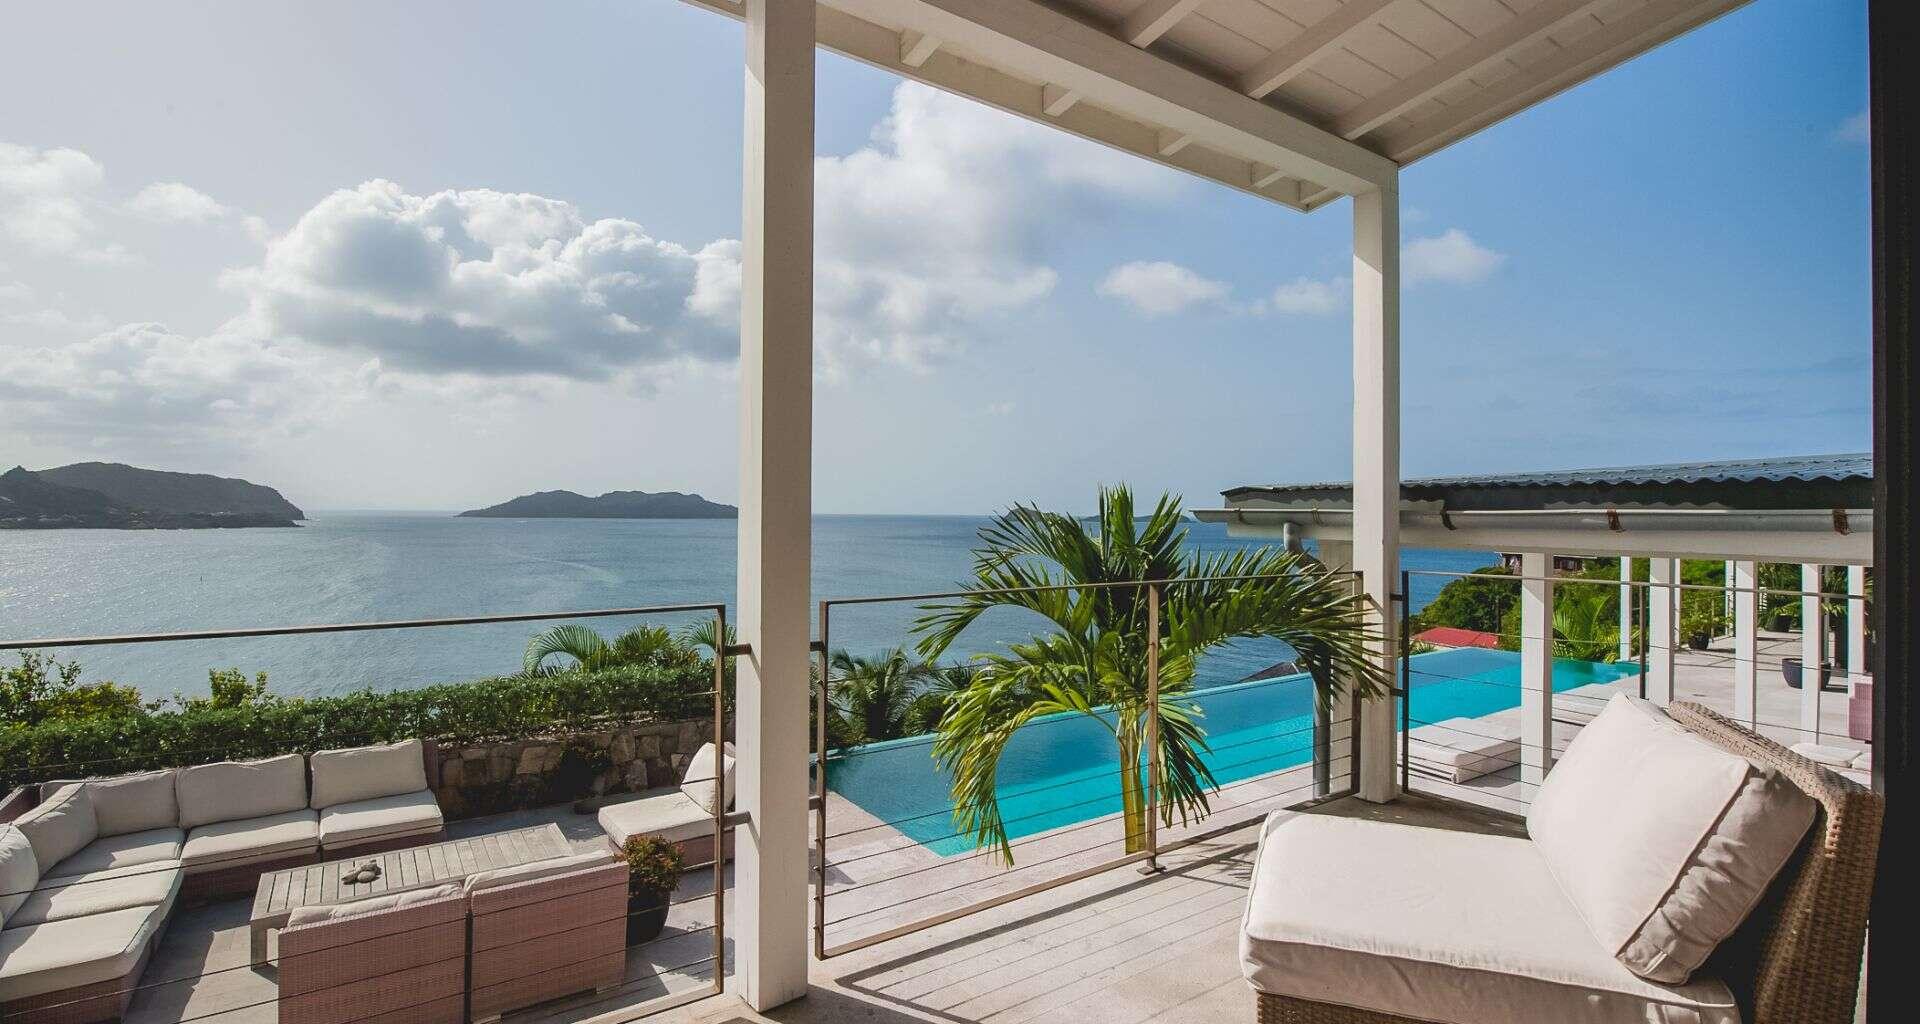 Luxury villa rentals caribbean - St barthelemy - Saint jean - No location 4 - Villa Ella - Image 1/13